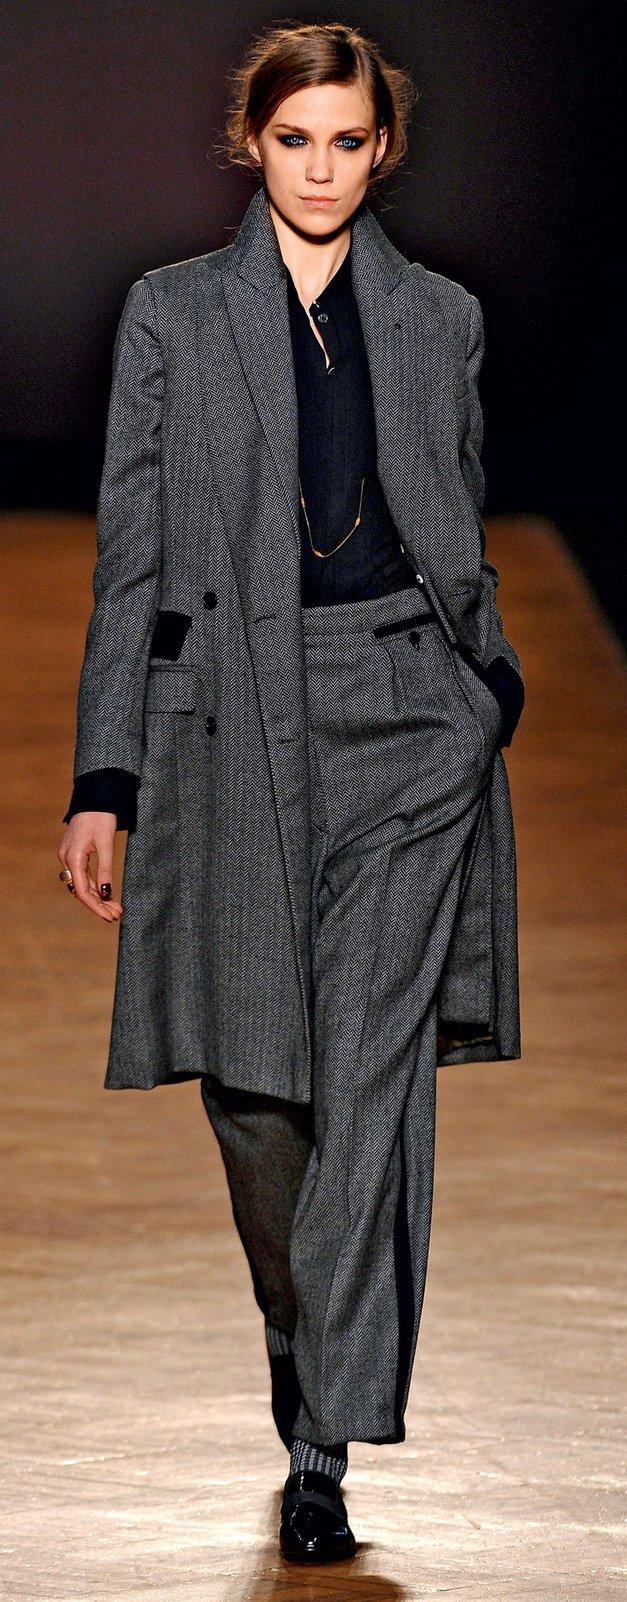 PAUL SMITH (foto: Alex Štokelj, All-About-Fashion)